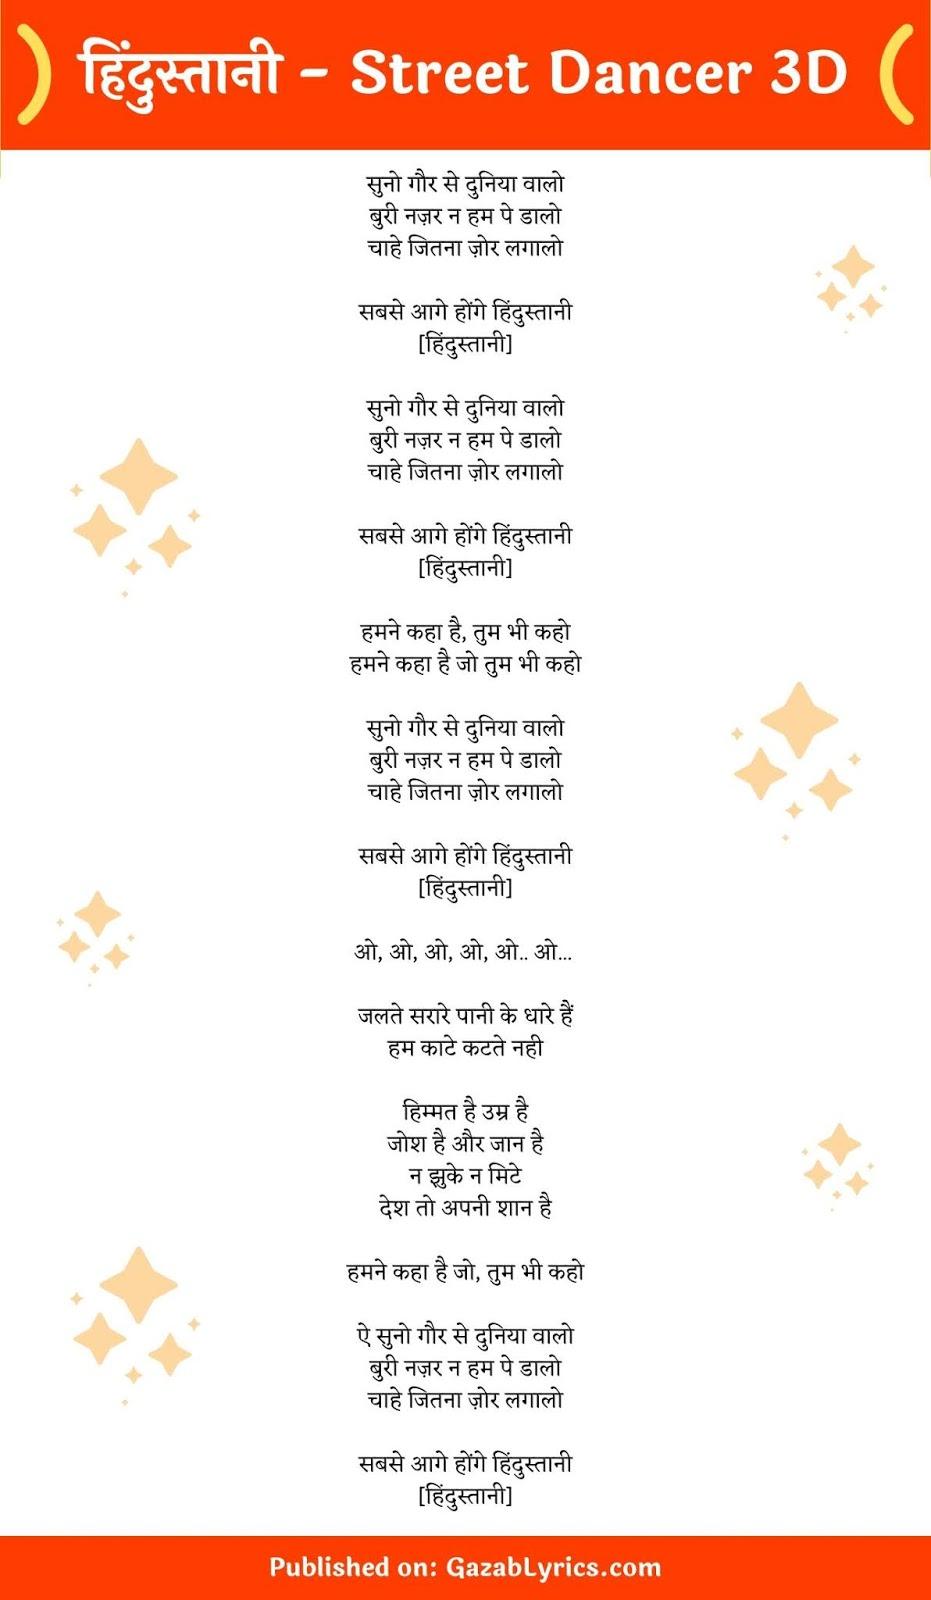 Hindustani song lyrics image